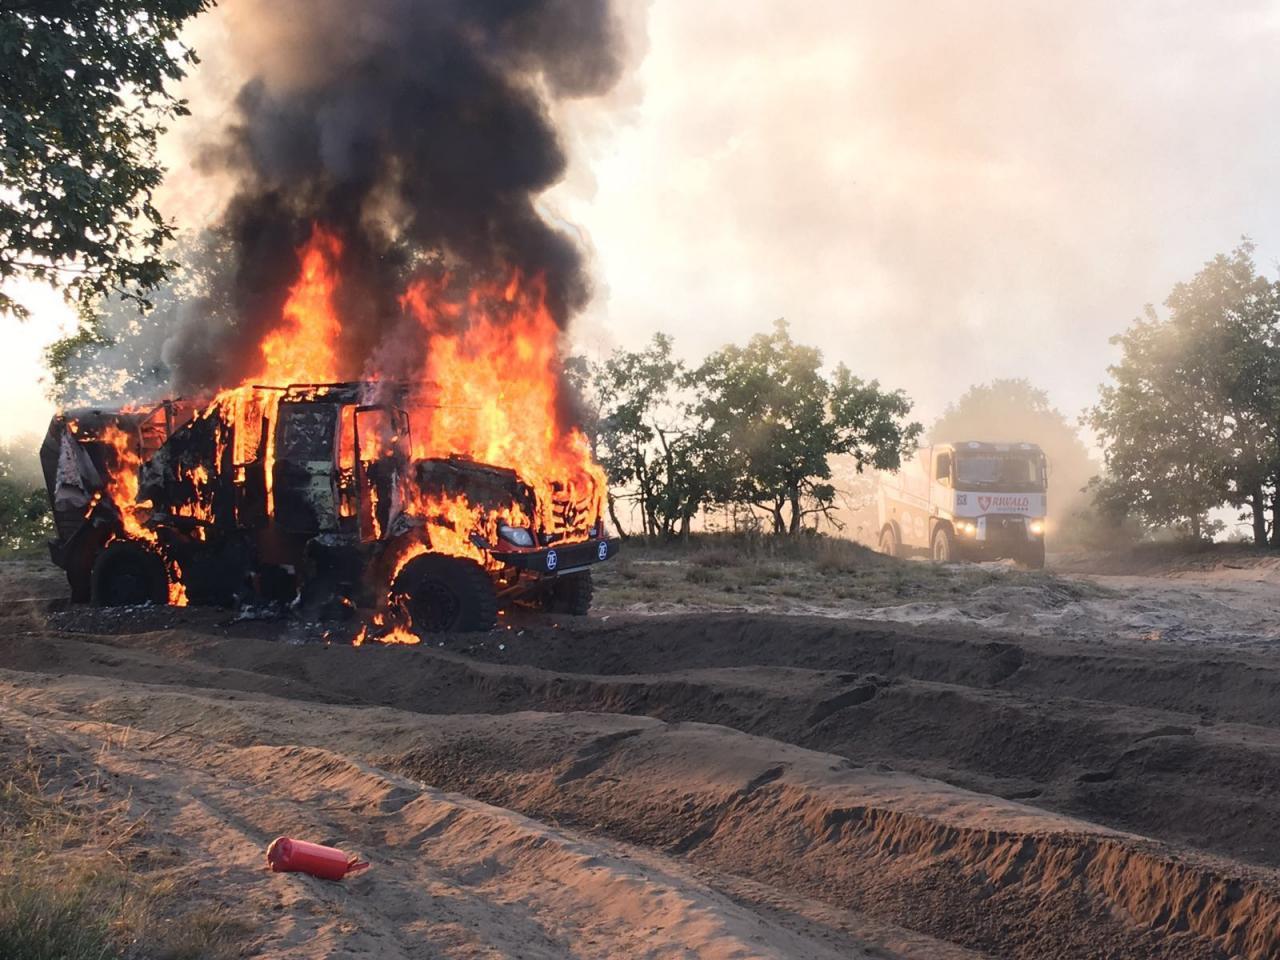 Truck Mammoet Rallysport afgebrand tijdens test